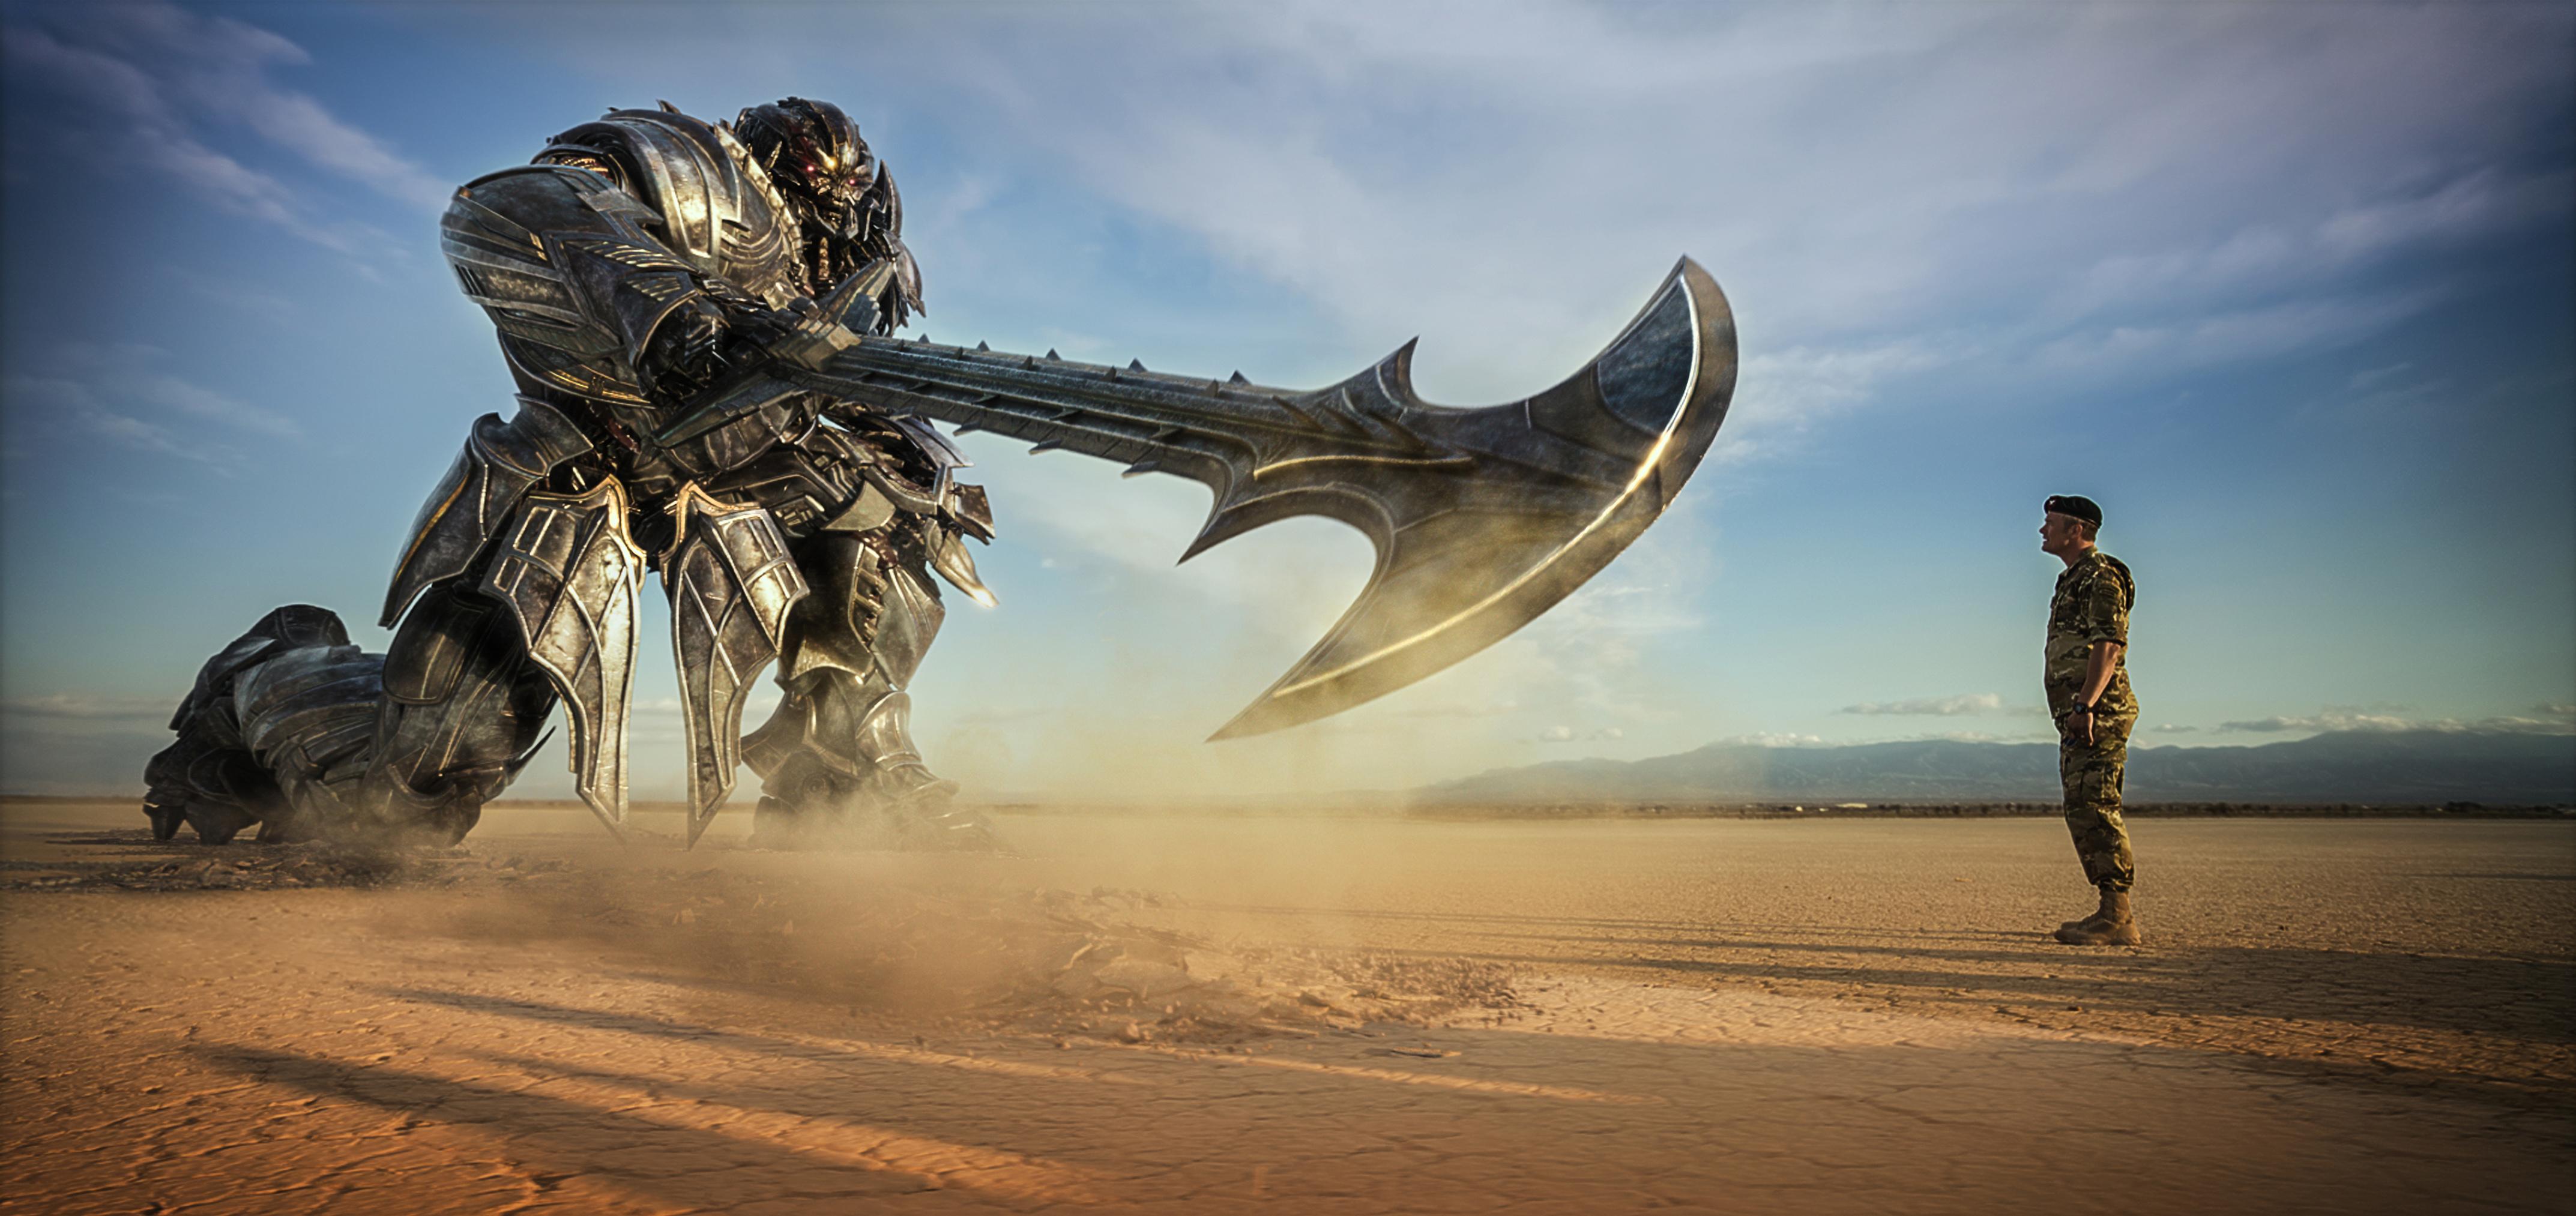 Transformers-The-Last-Knight-4K-UHD-Blu-ray-Review-Szene-7.jpg